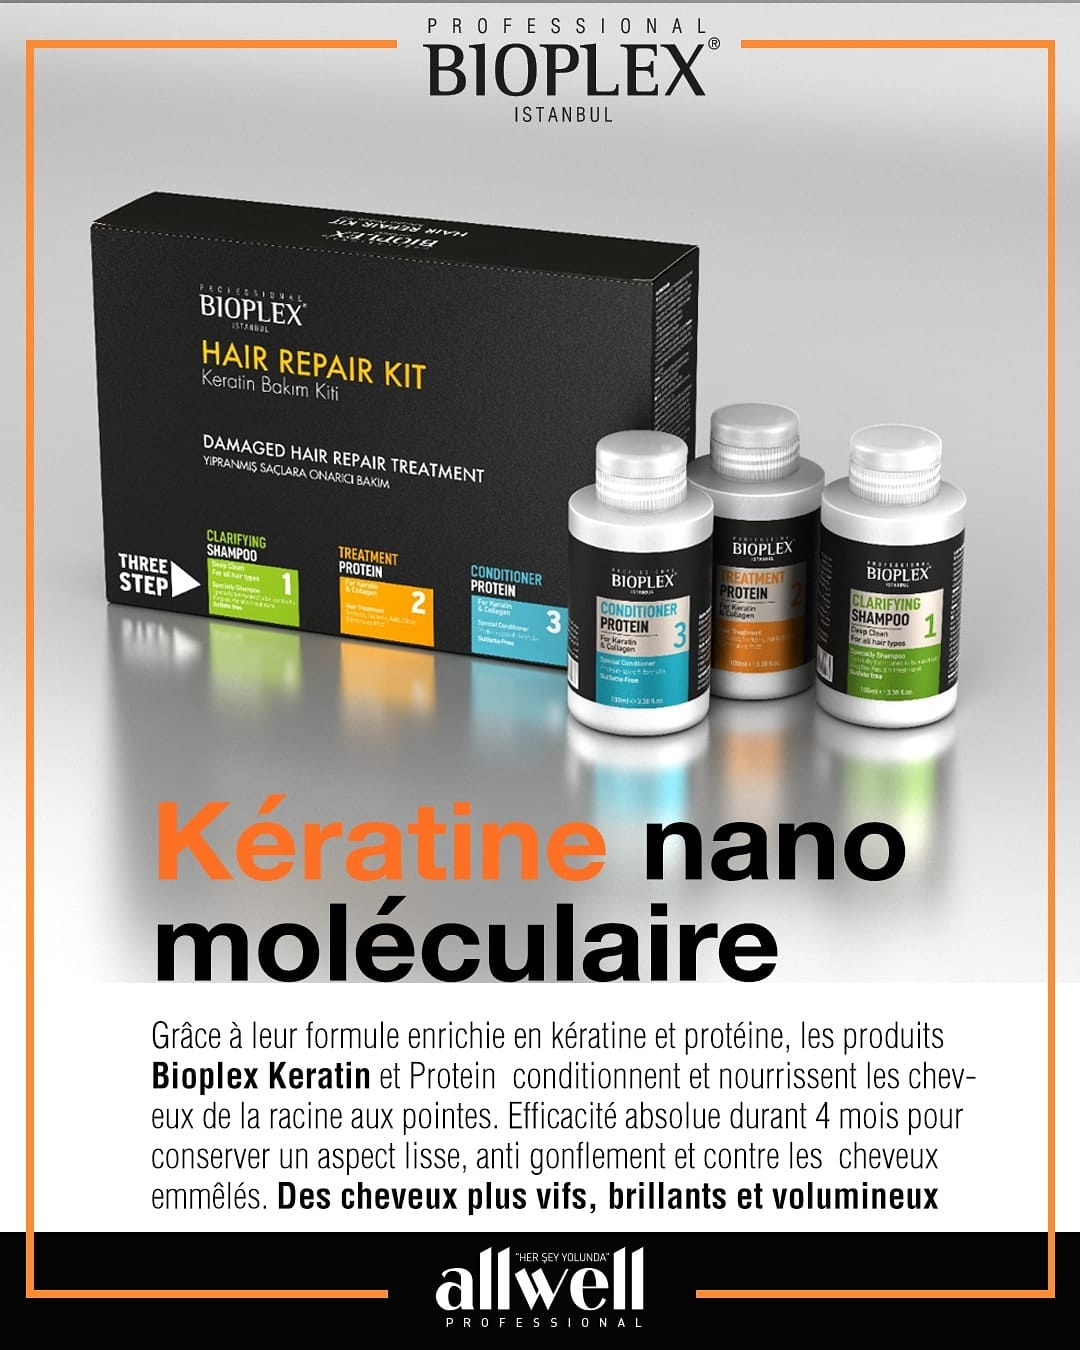 bioplex-keratine-nano-moleculaire-kit